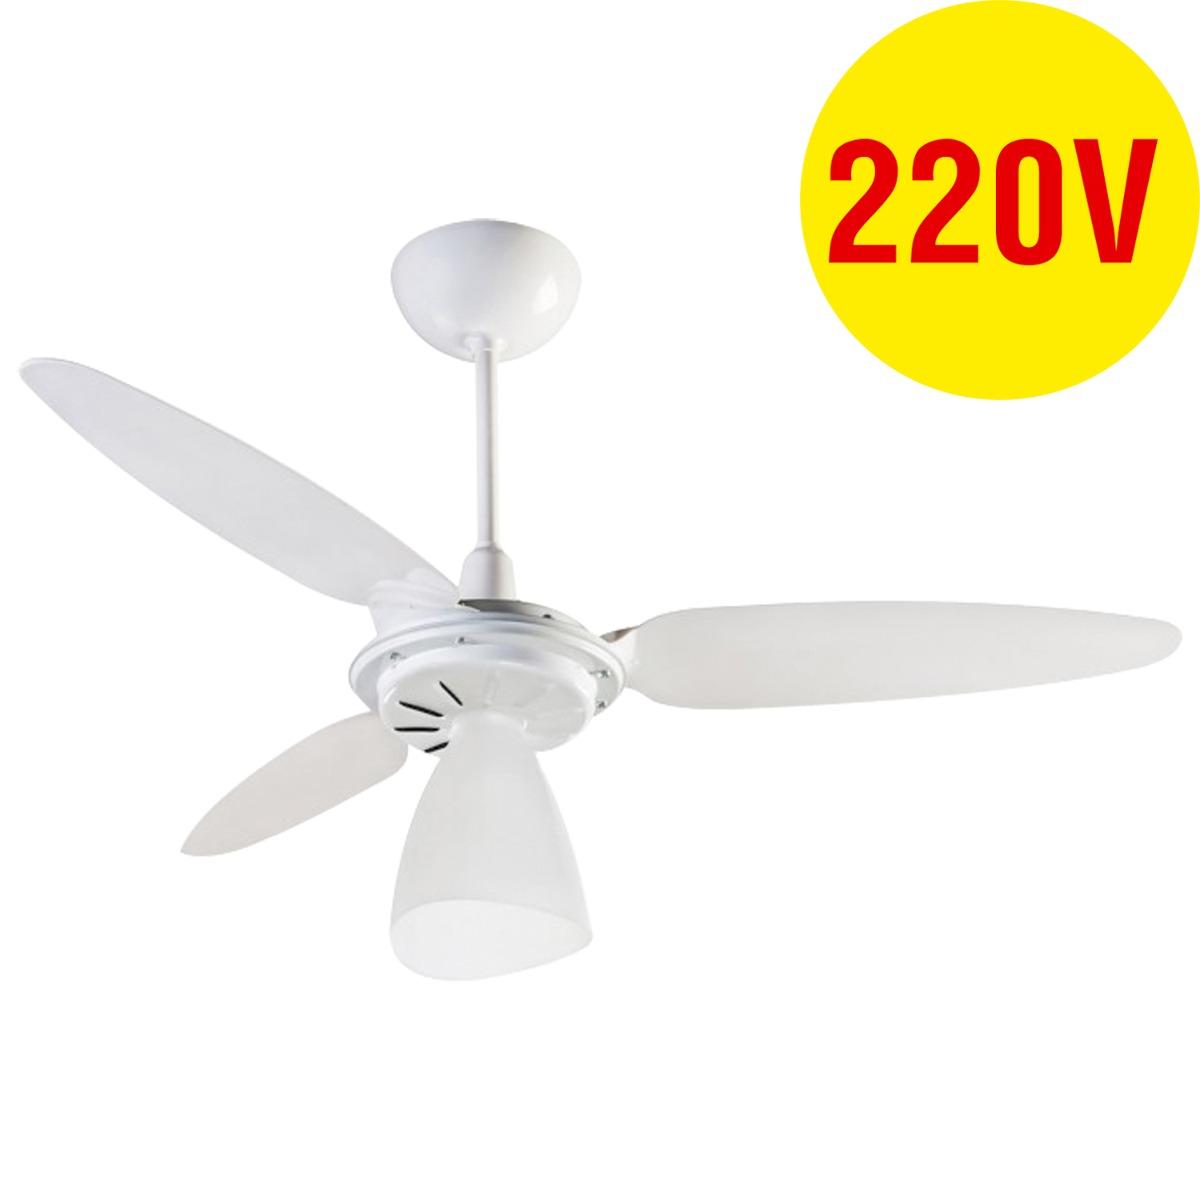 425777bc9 Características. Marca Ventisol  Modelo Wind Light  Tipo de ventilador De  teto ...